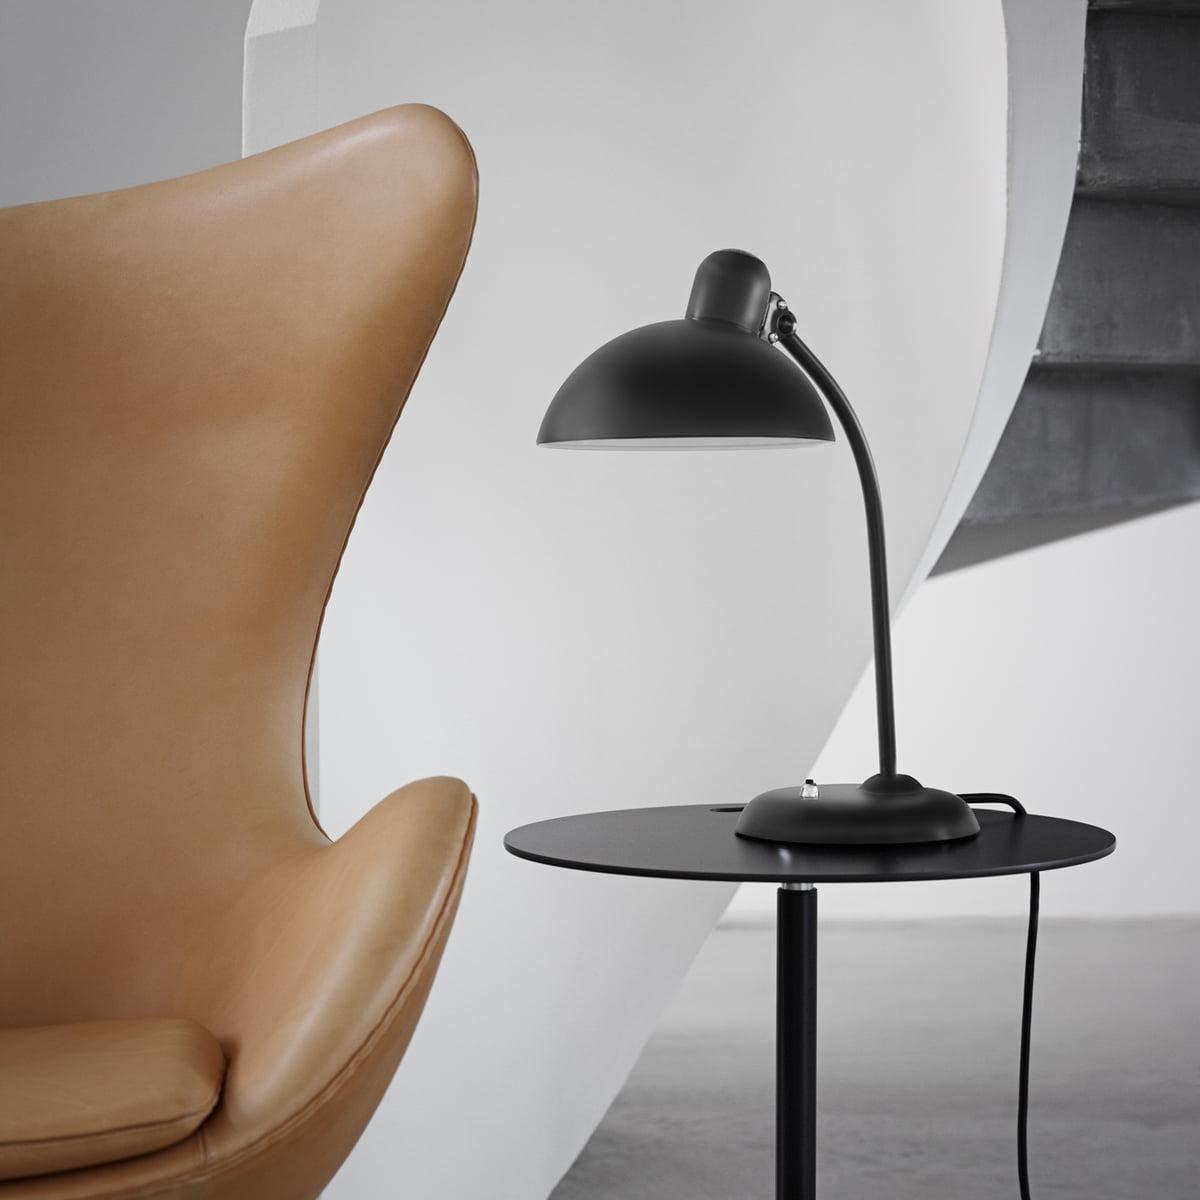 6556 t tischleuchte kaiser idell original. Black Bedroom Furniture Sets. Home Design Ideas